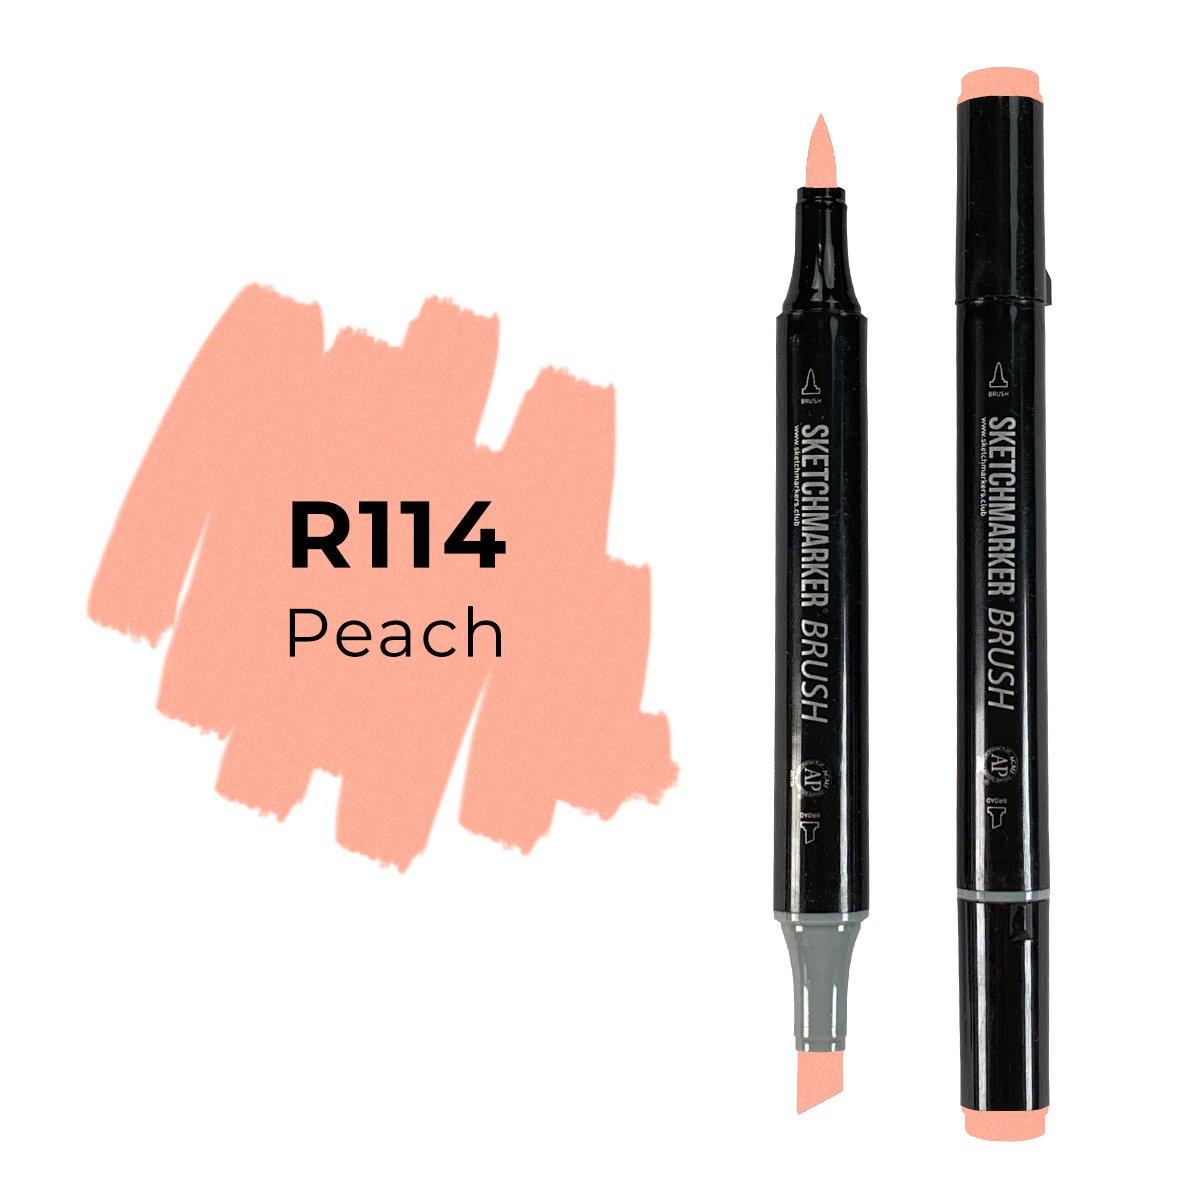 SKETCHMARKER BRUSH PRO Color: Peach